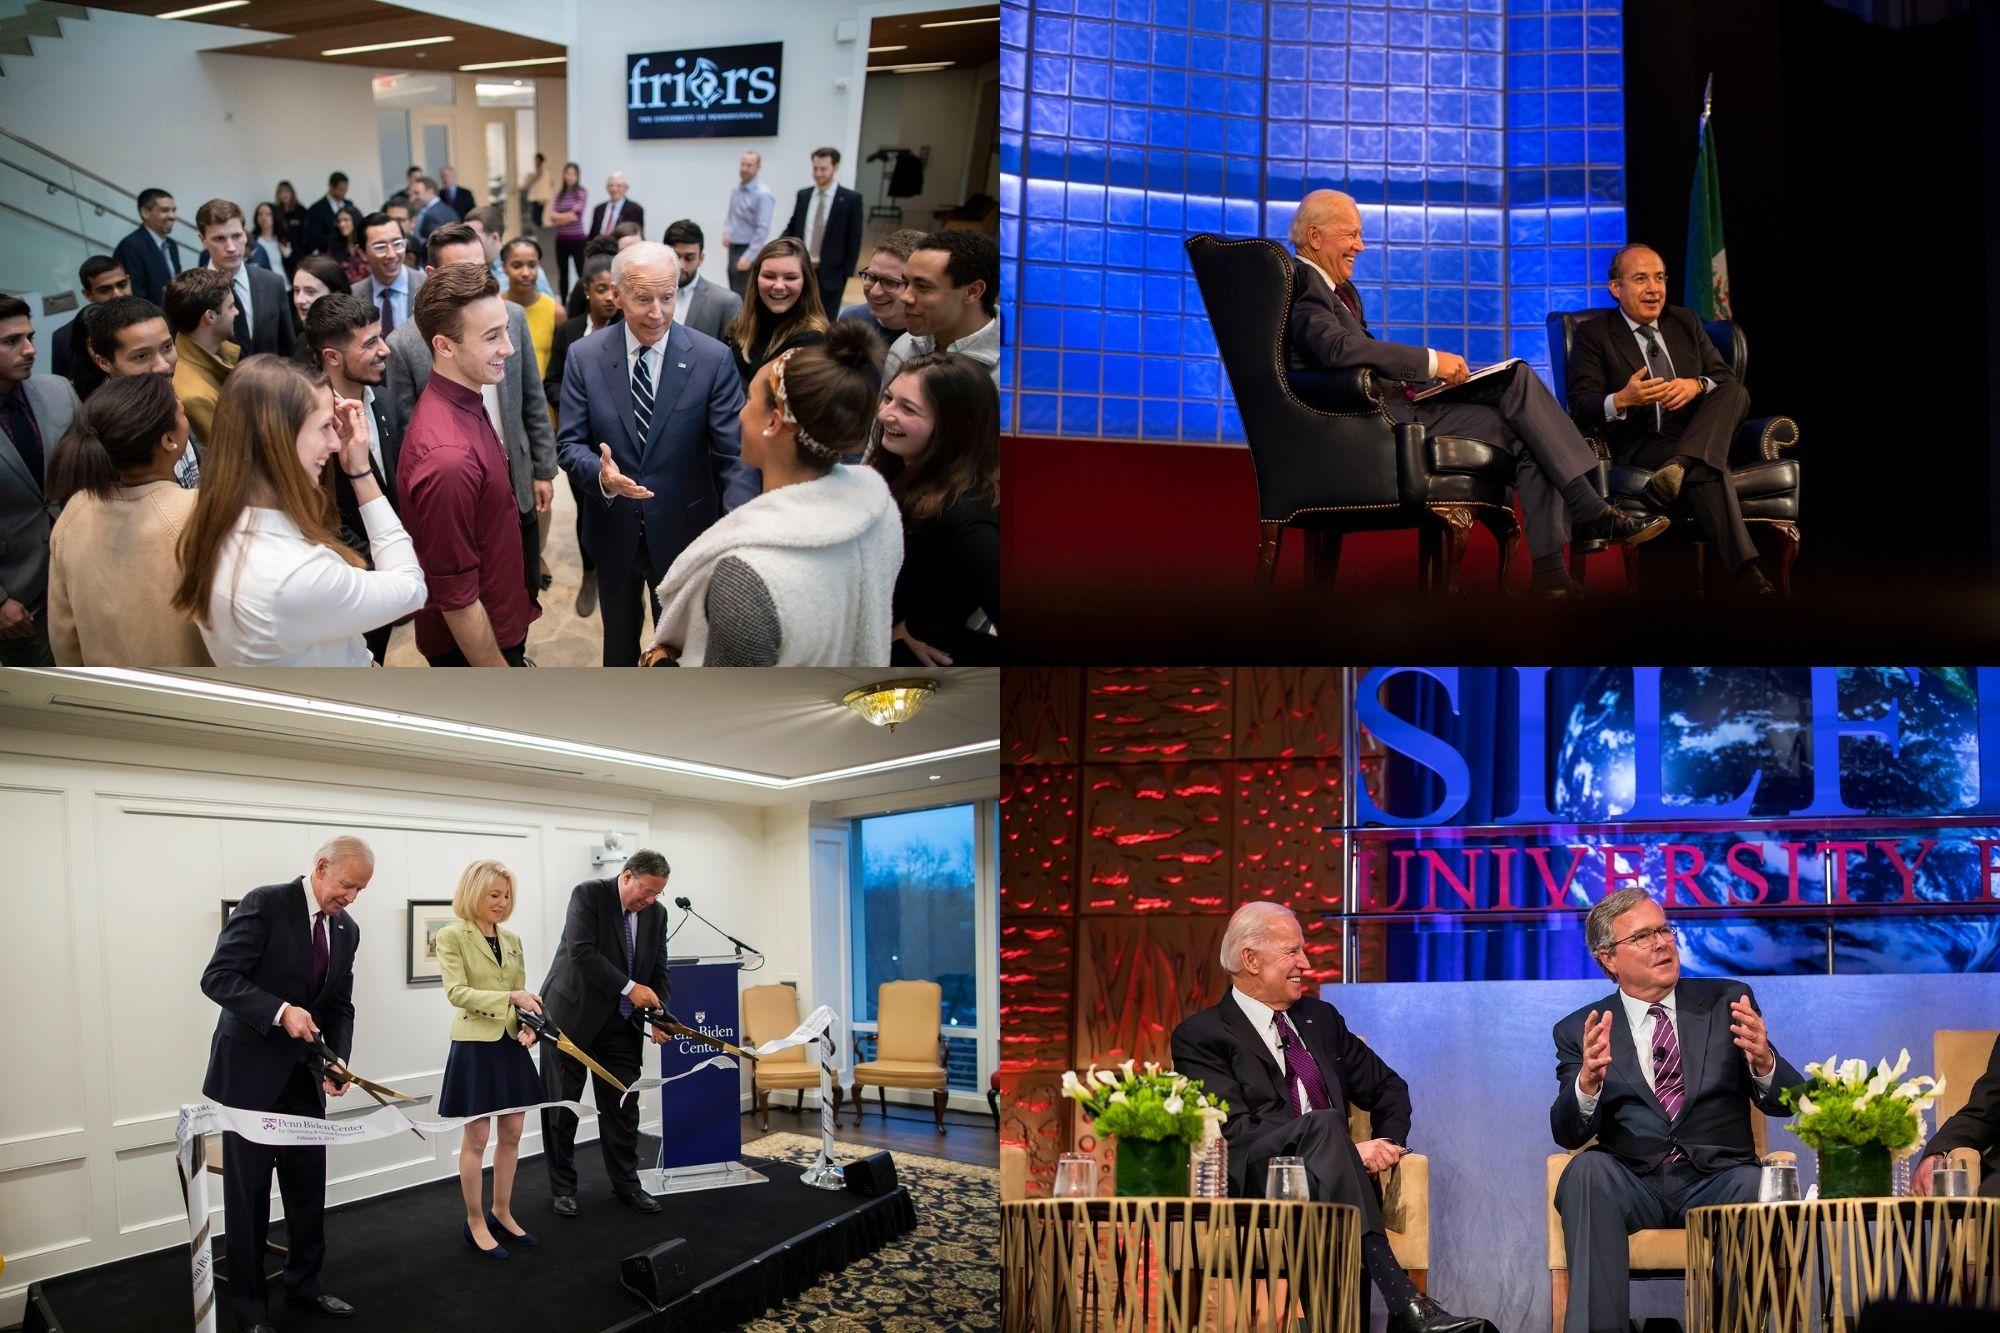 Joe Biden's longtime ties to Penn